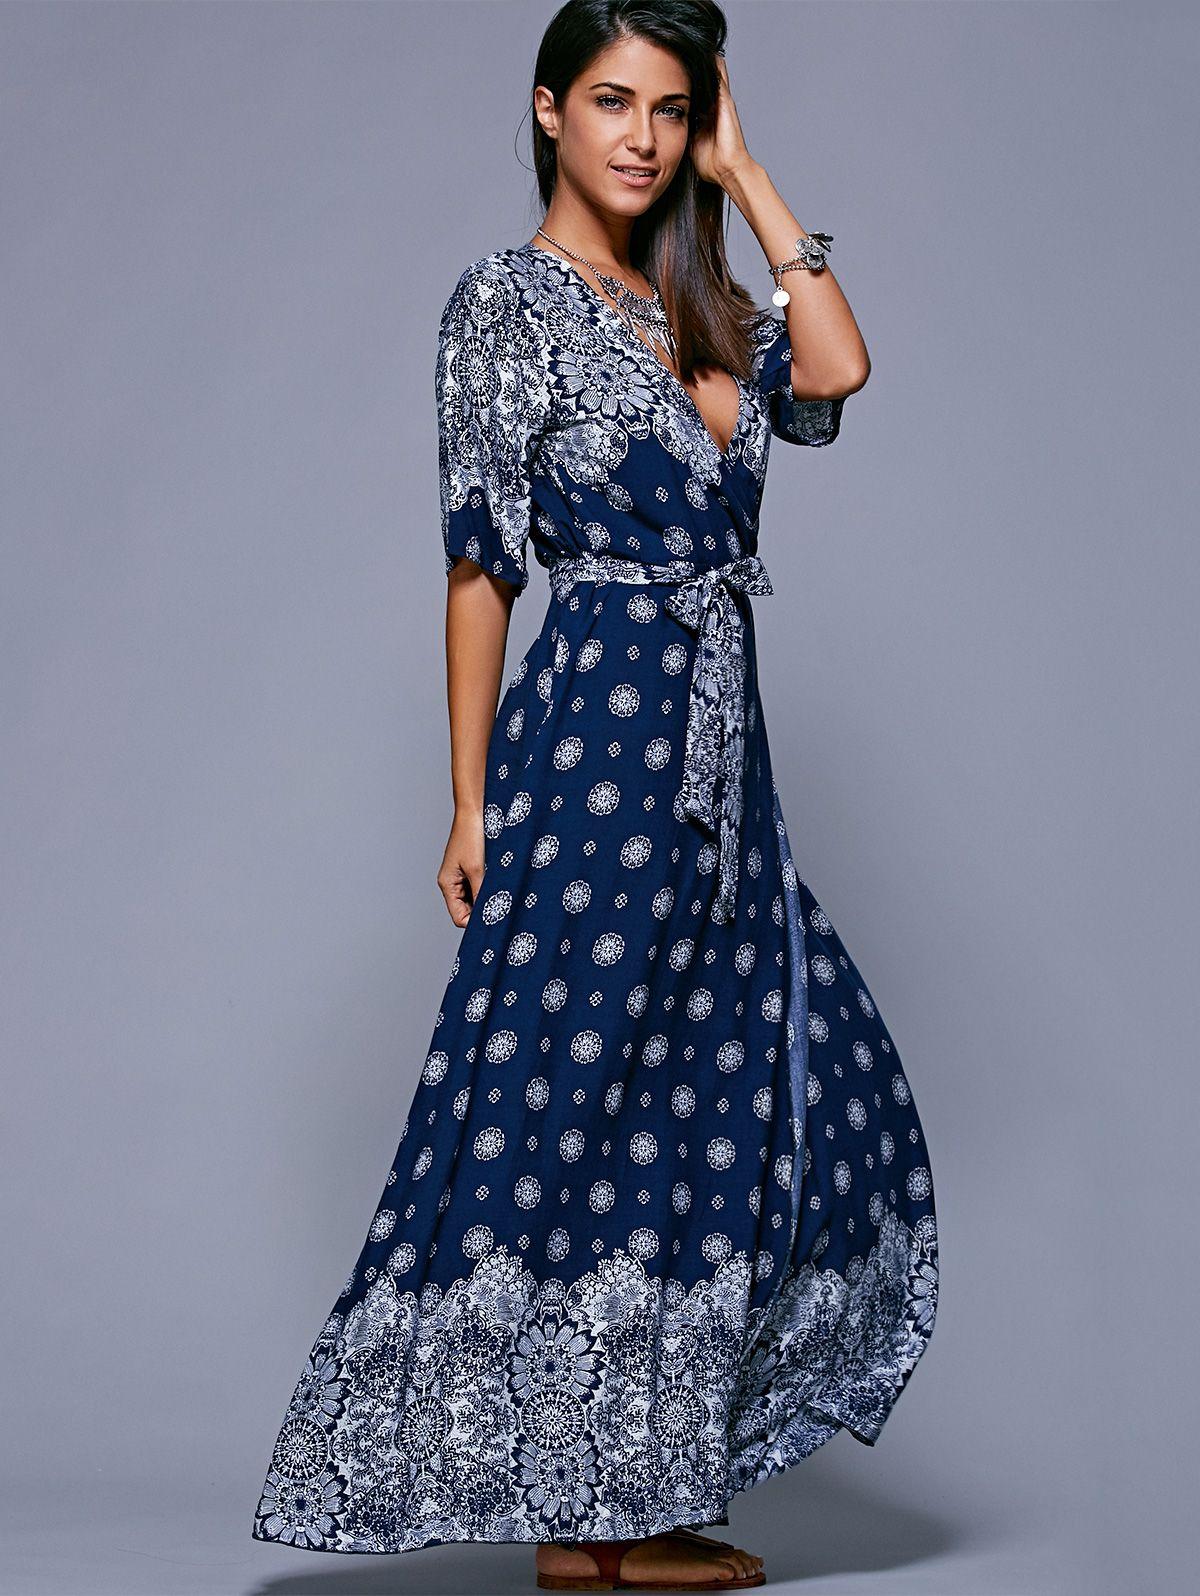 Slit Print Long Flowing Wrap Plunge Dress Modest outfits Fabrics